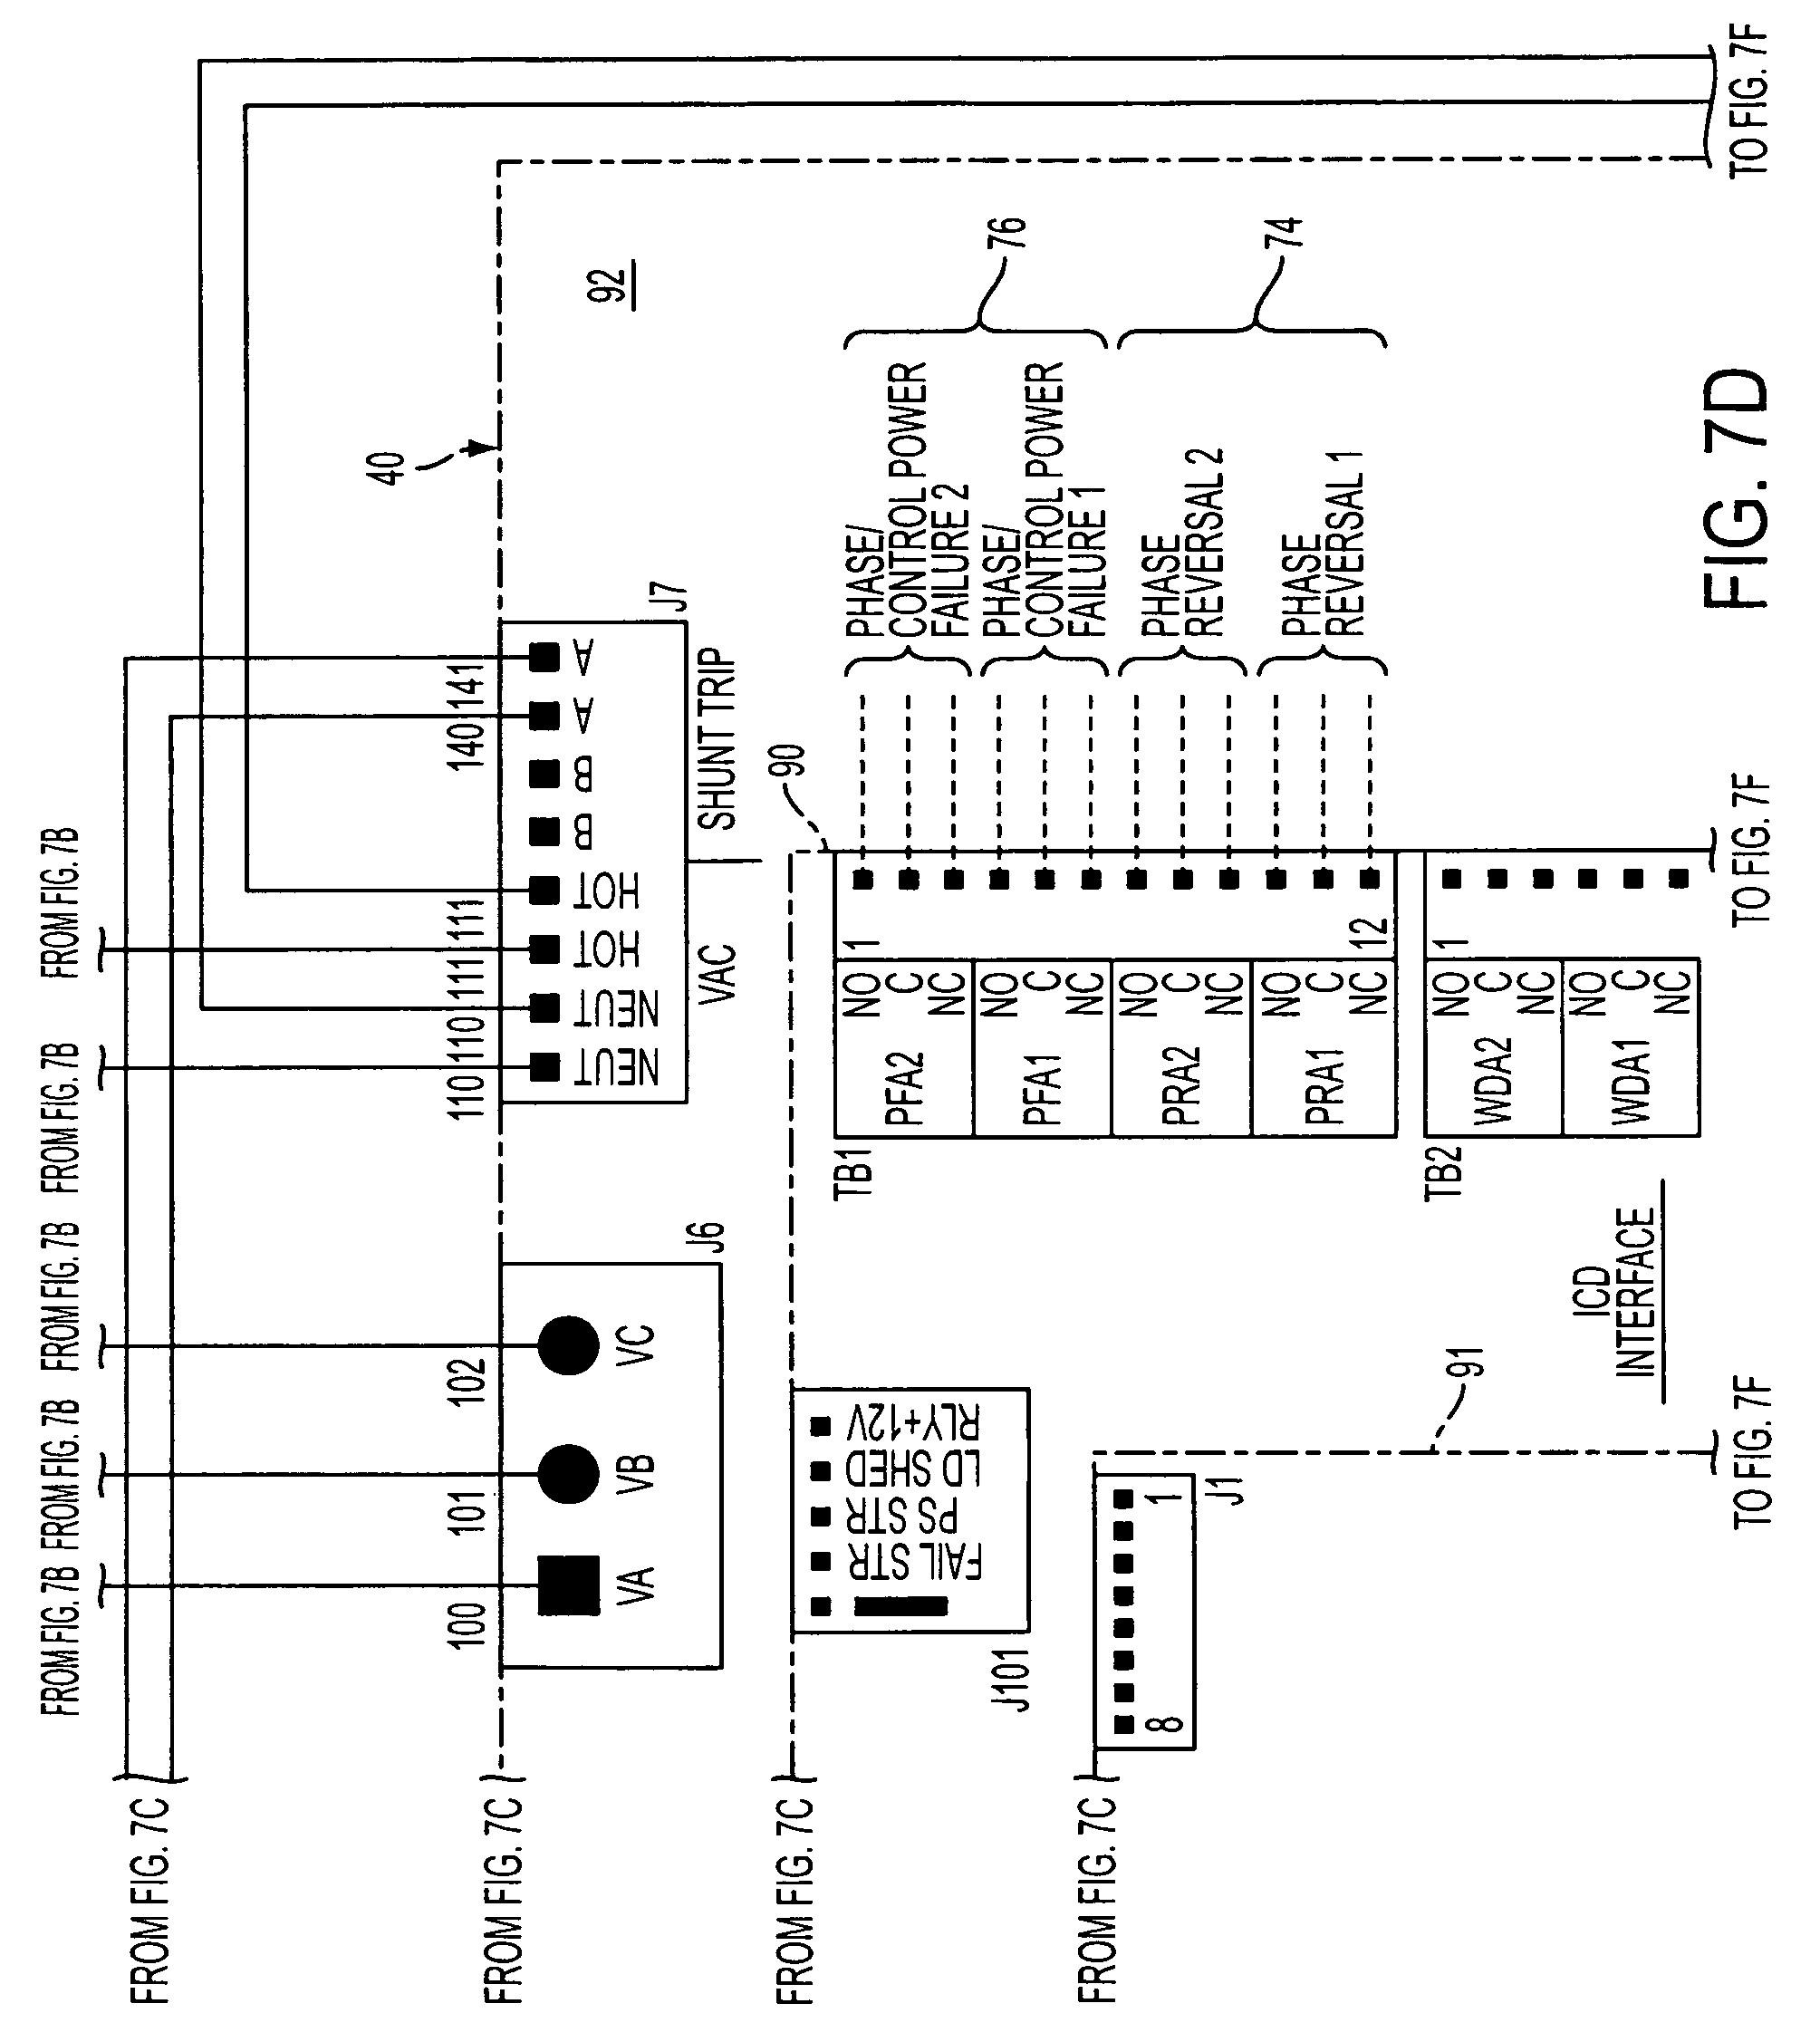 Duct Smoke Detector Wiring Diagram Download